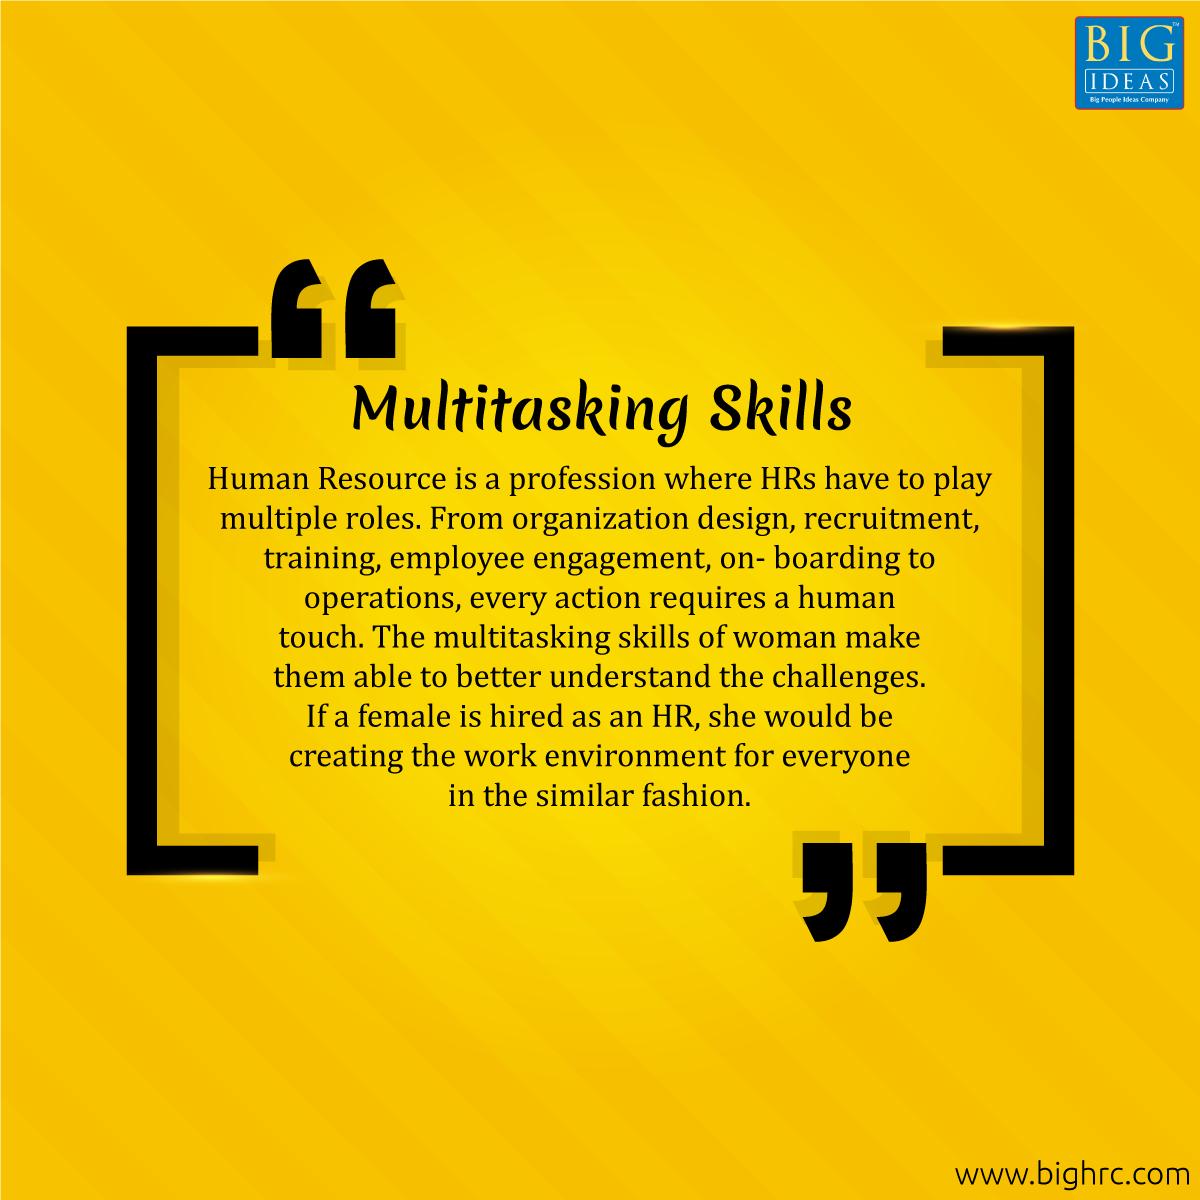 Here is the 3rd reason why women lead in human resources. #HumanResource #womenleaders #womenempowerment #BigIdeasHR